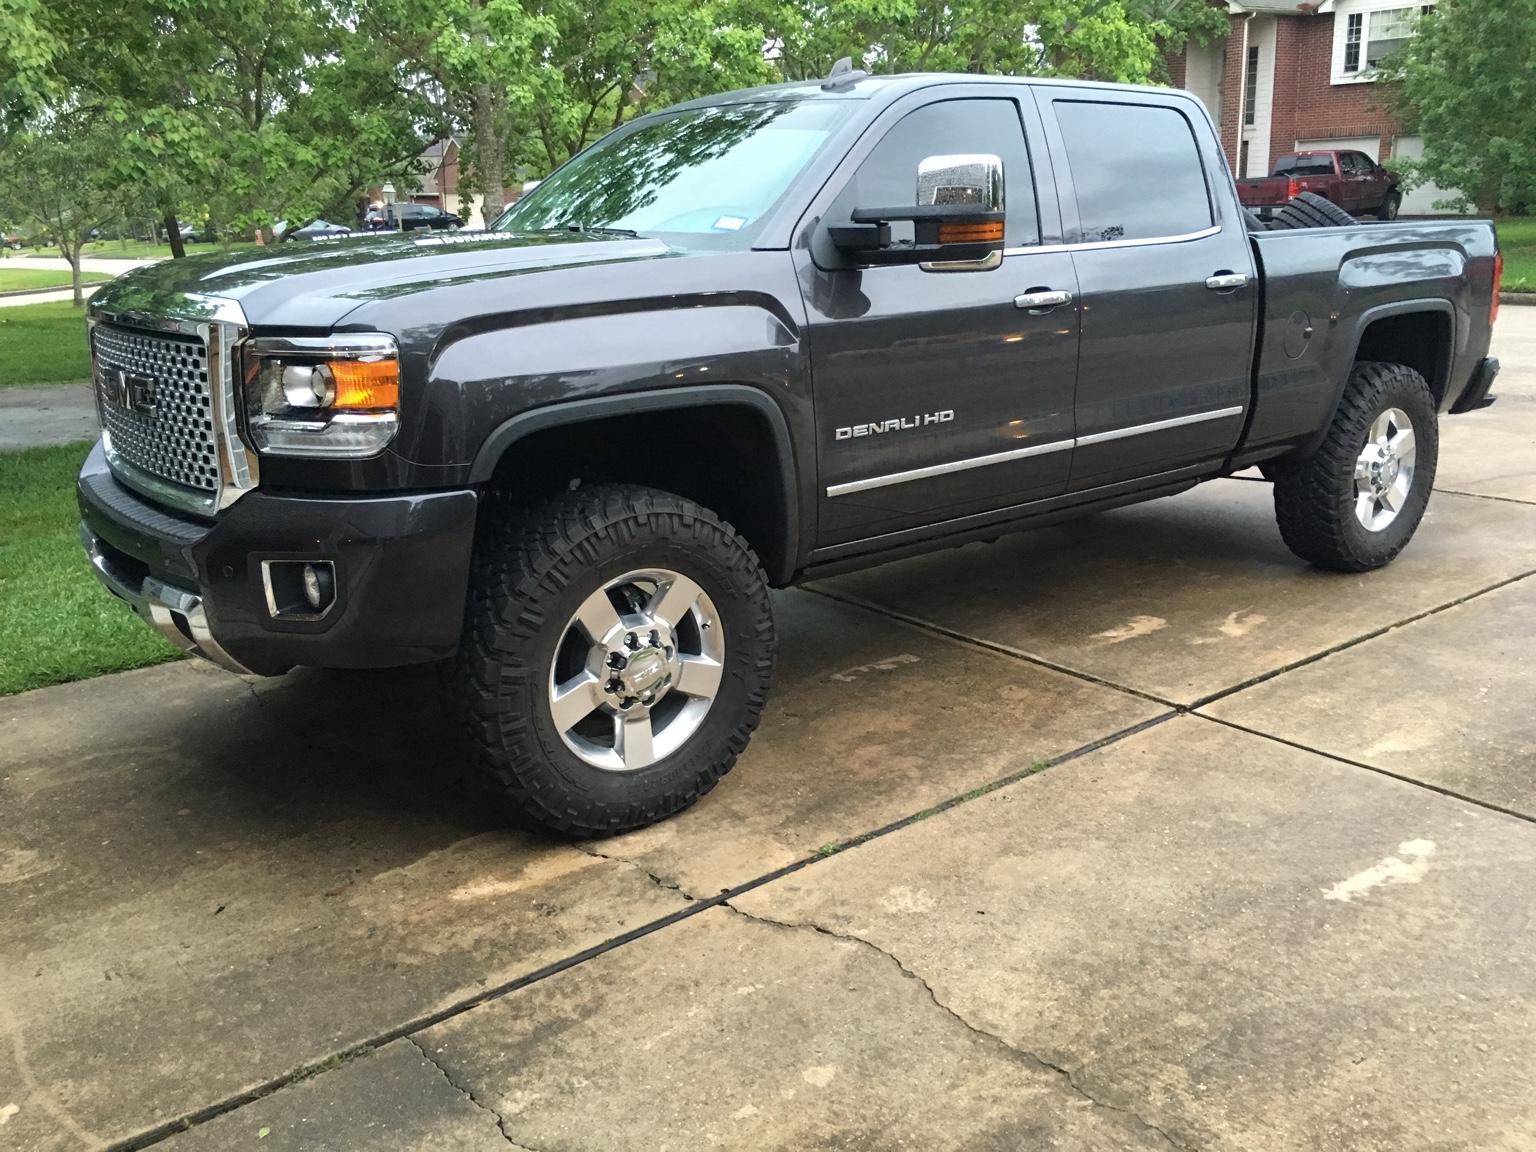 Leveled Lml On Stock 20 U0026 39 S W  Mud Tires  I Need Pics And